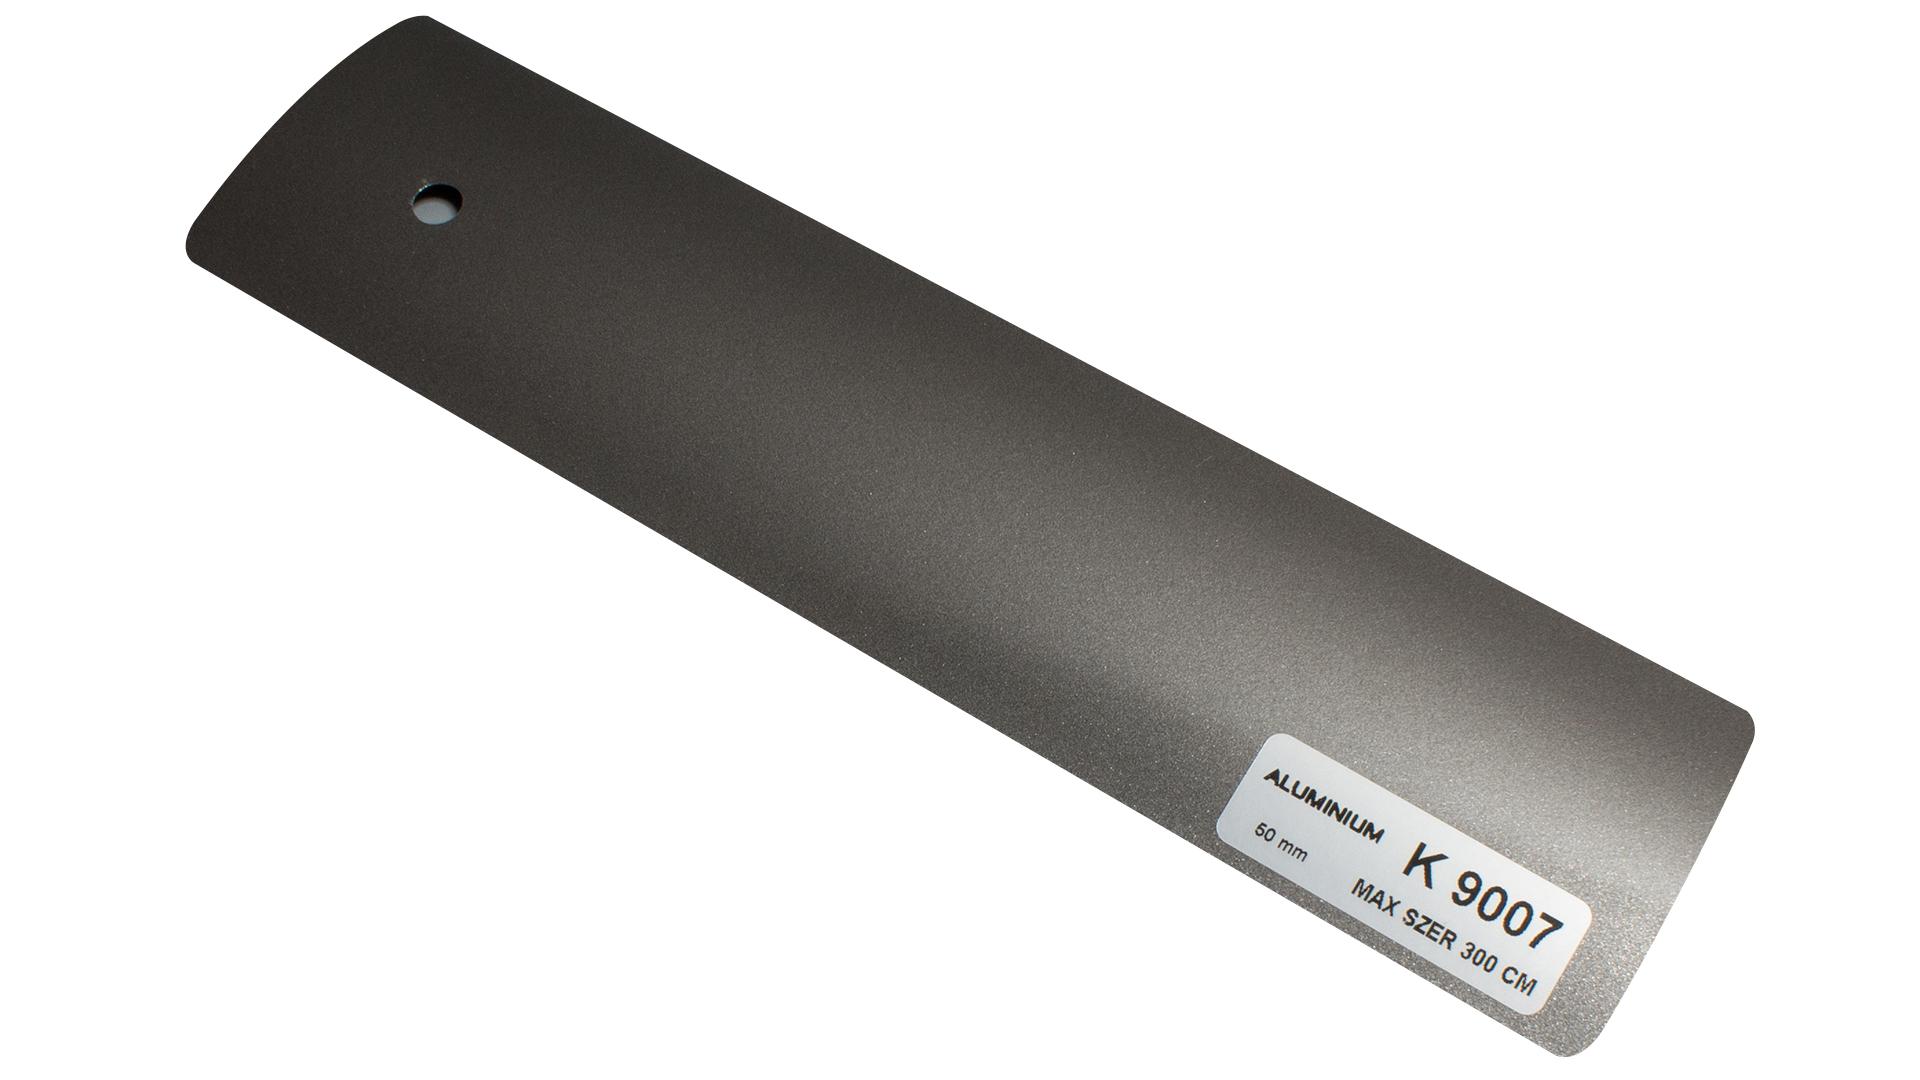 K9007